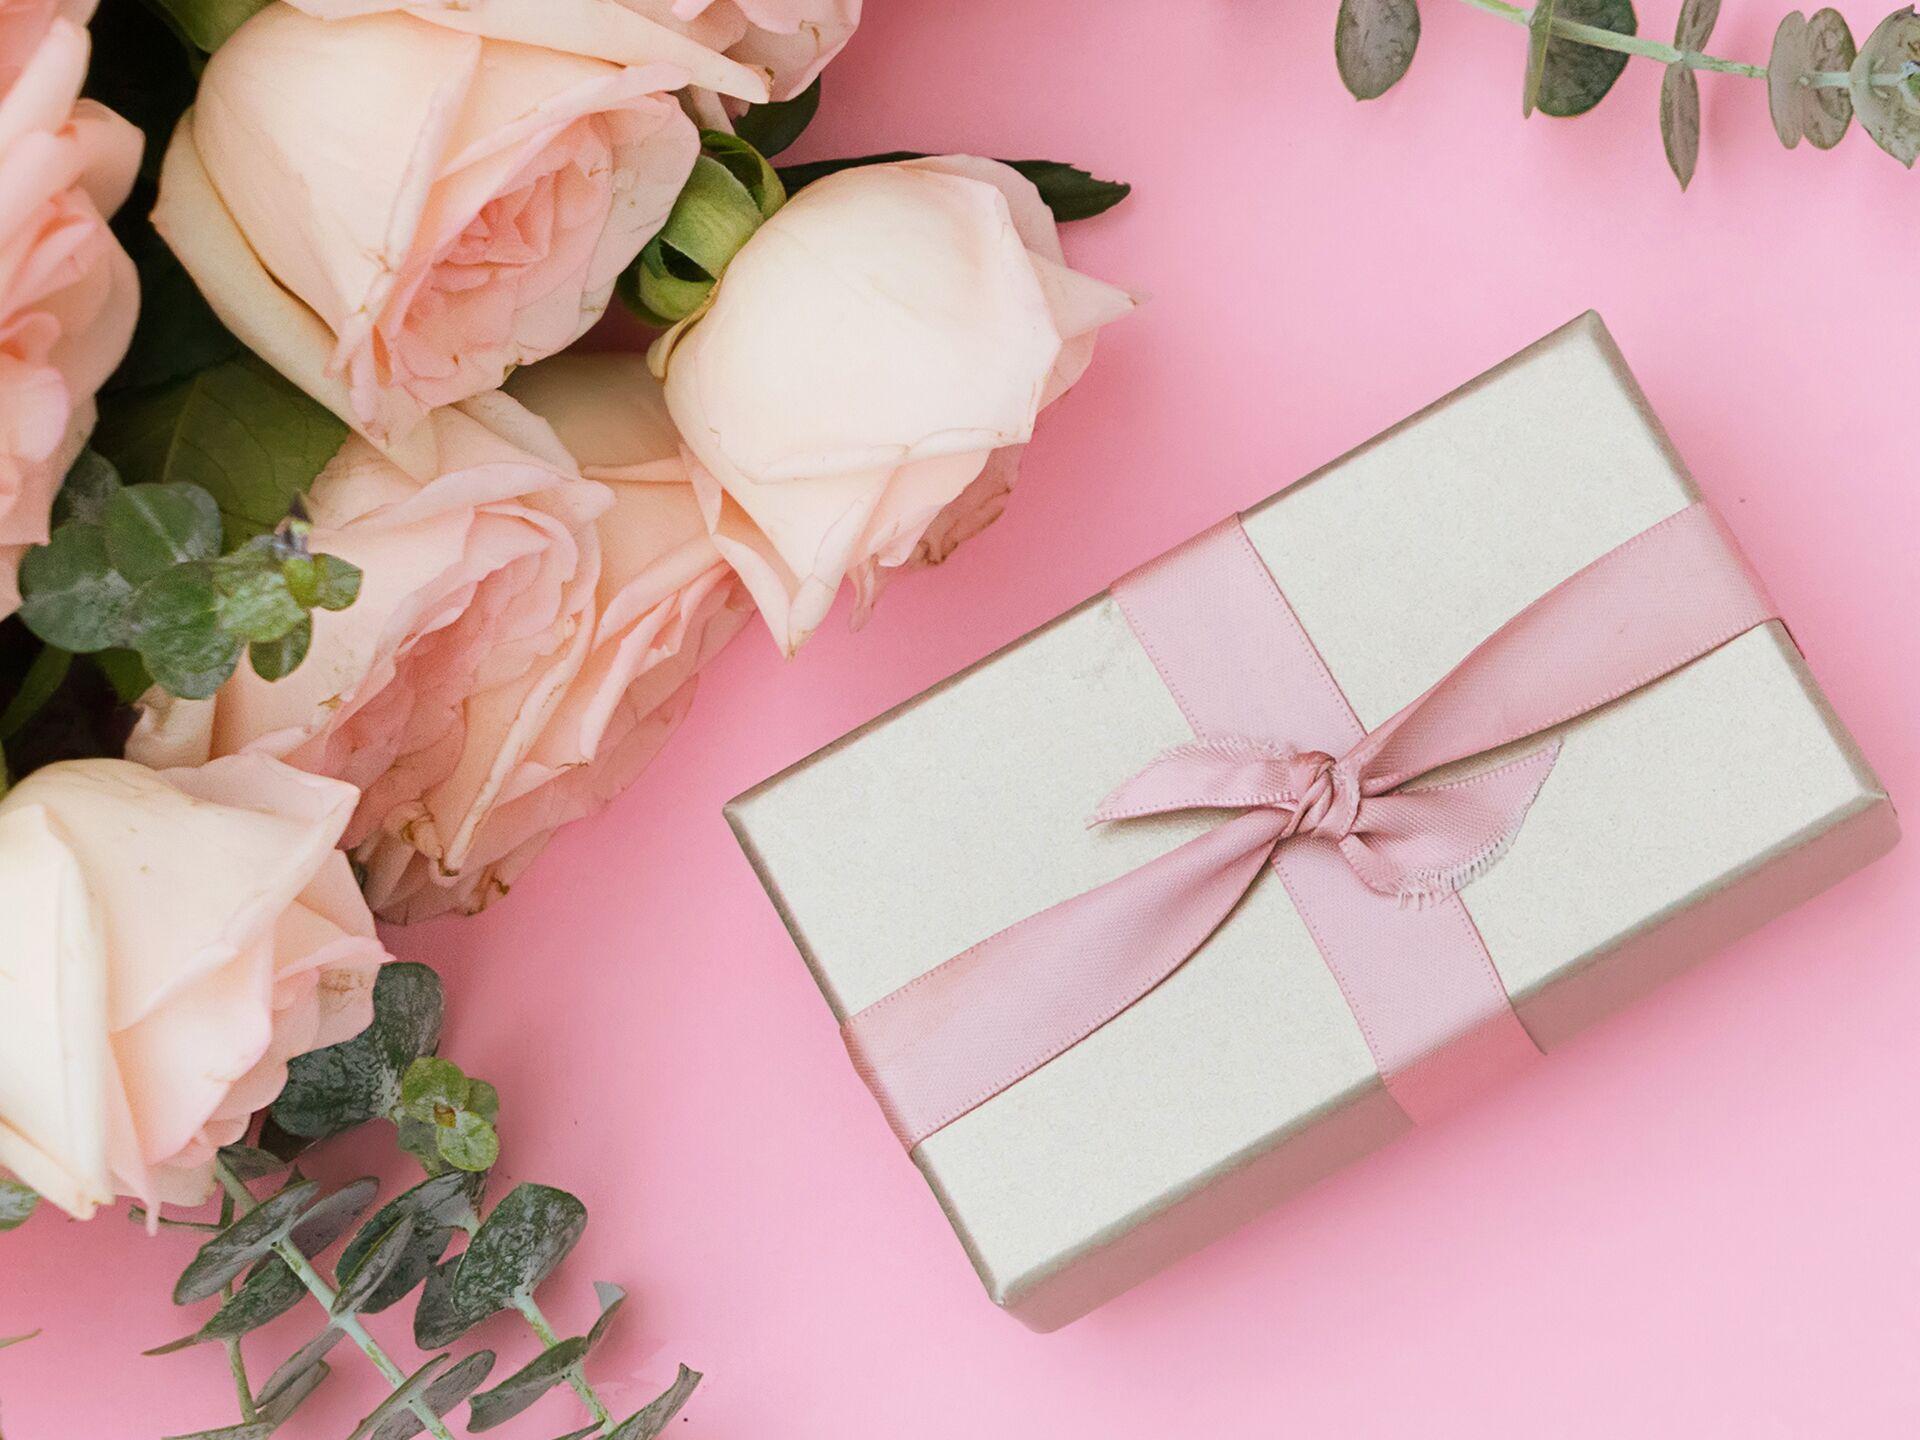 5 Tips For Proper Wedding Gift Etiquette The Knot